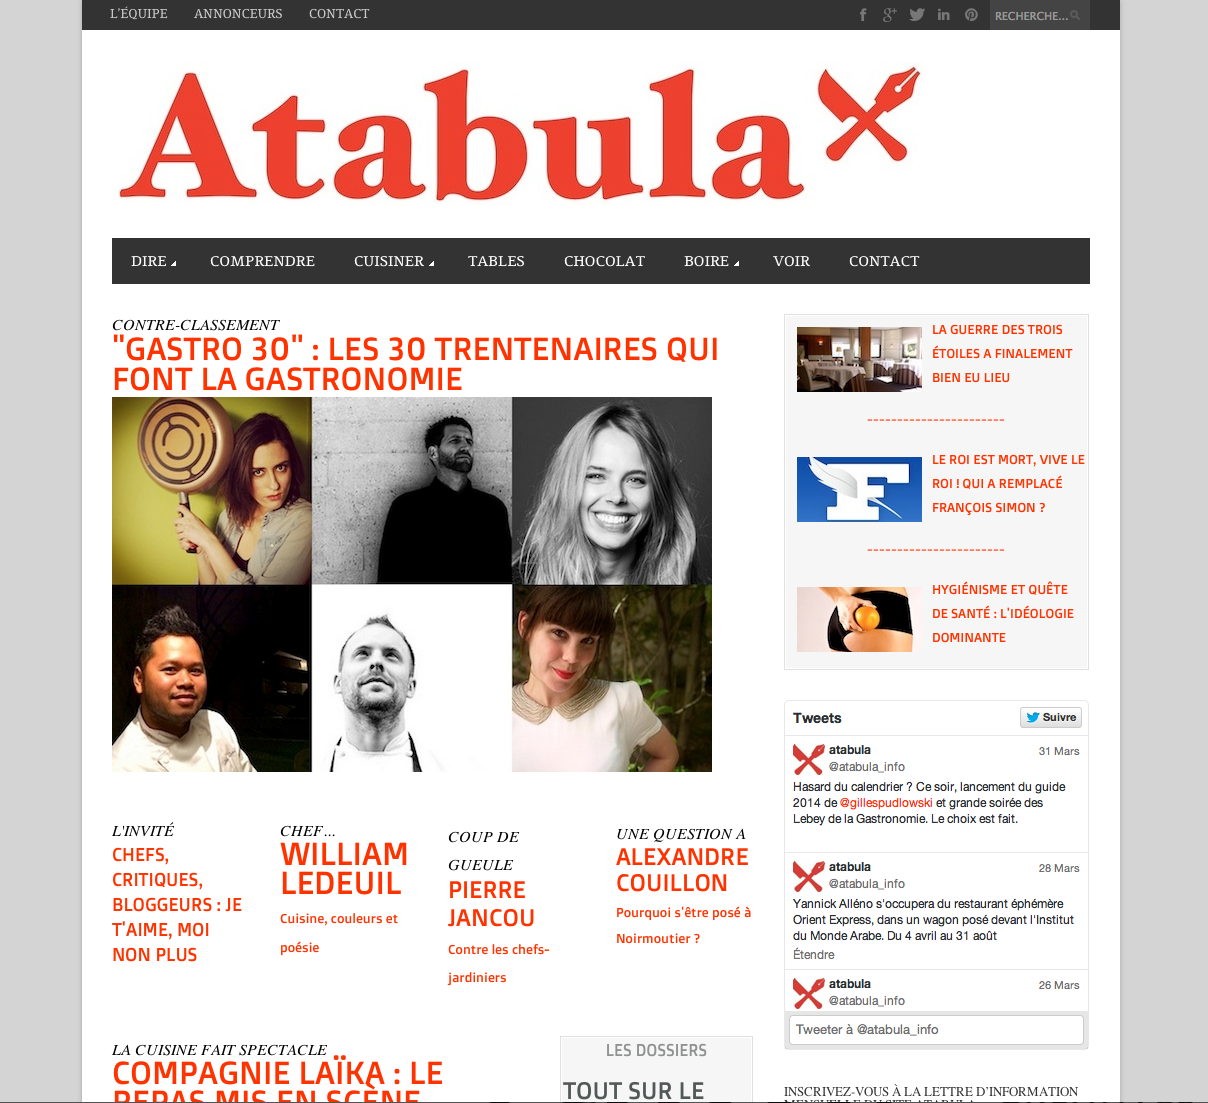 article atabula - 30 trentenaires font gastronomie